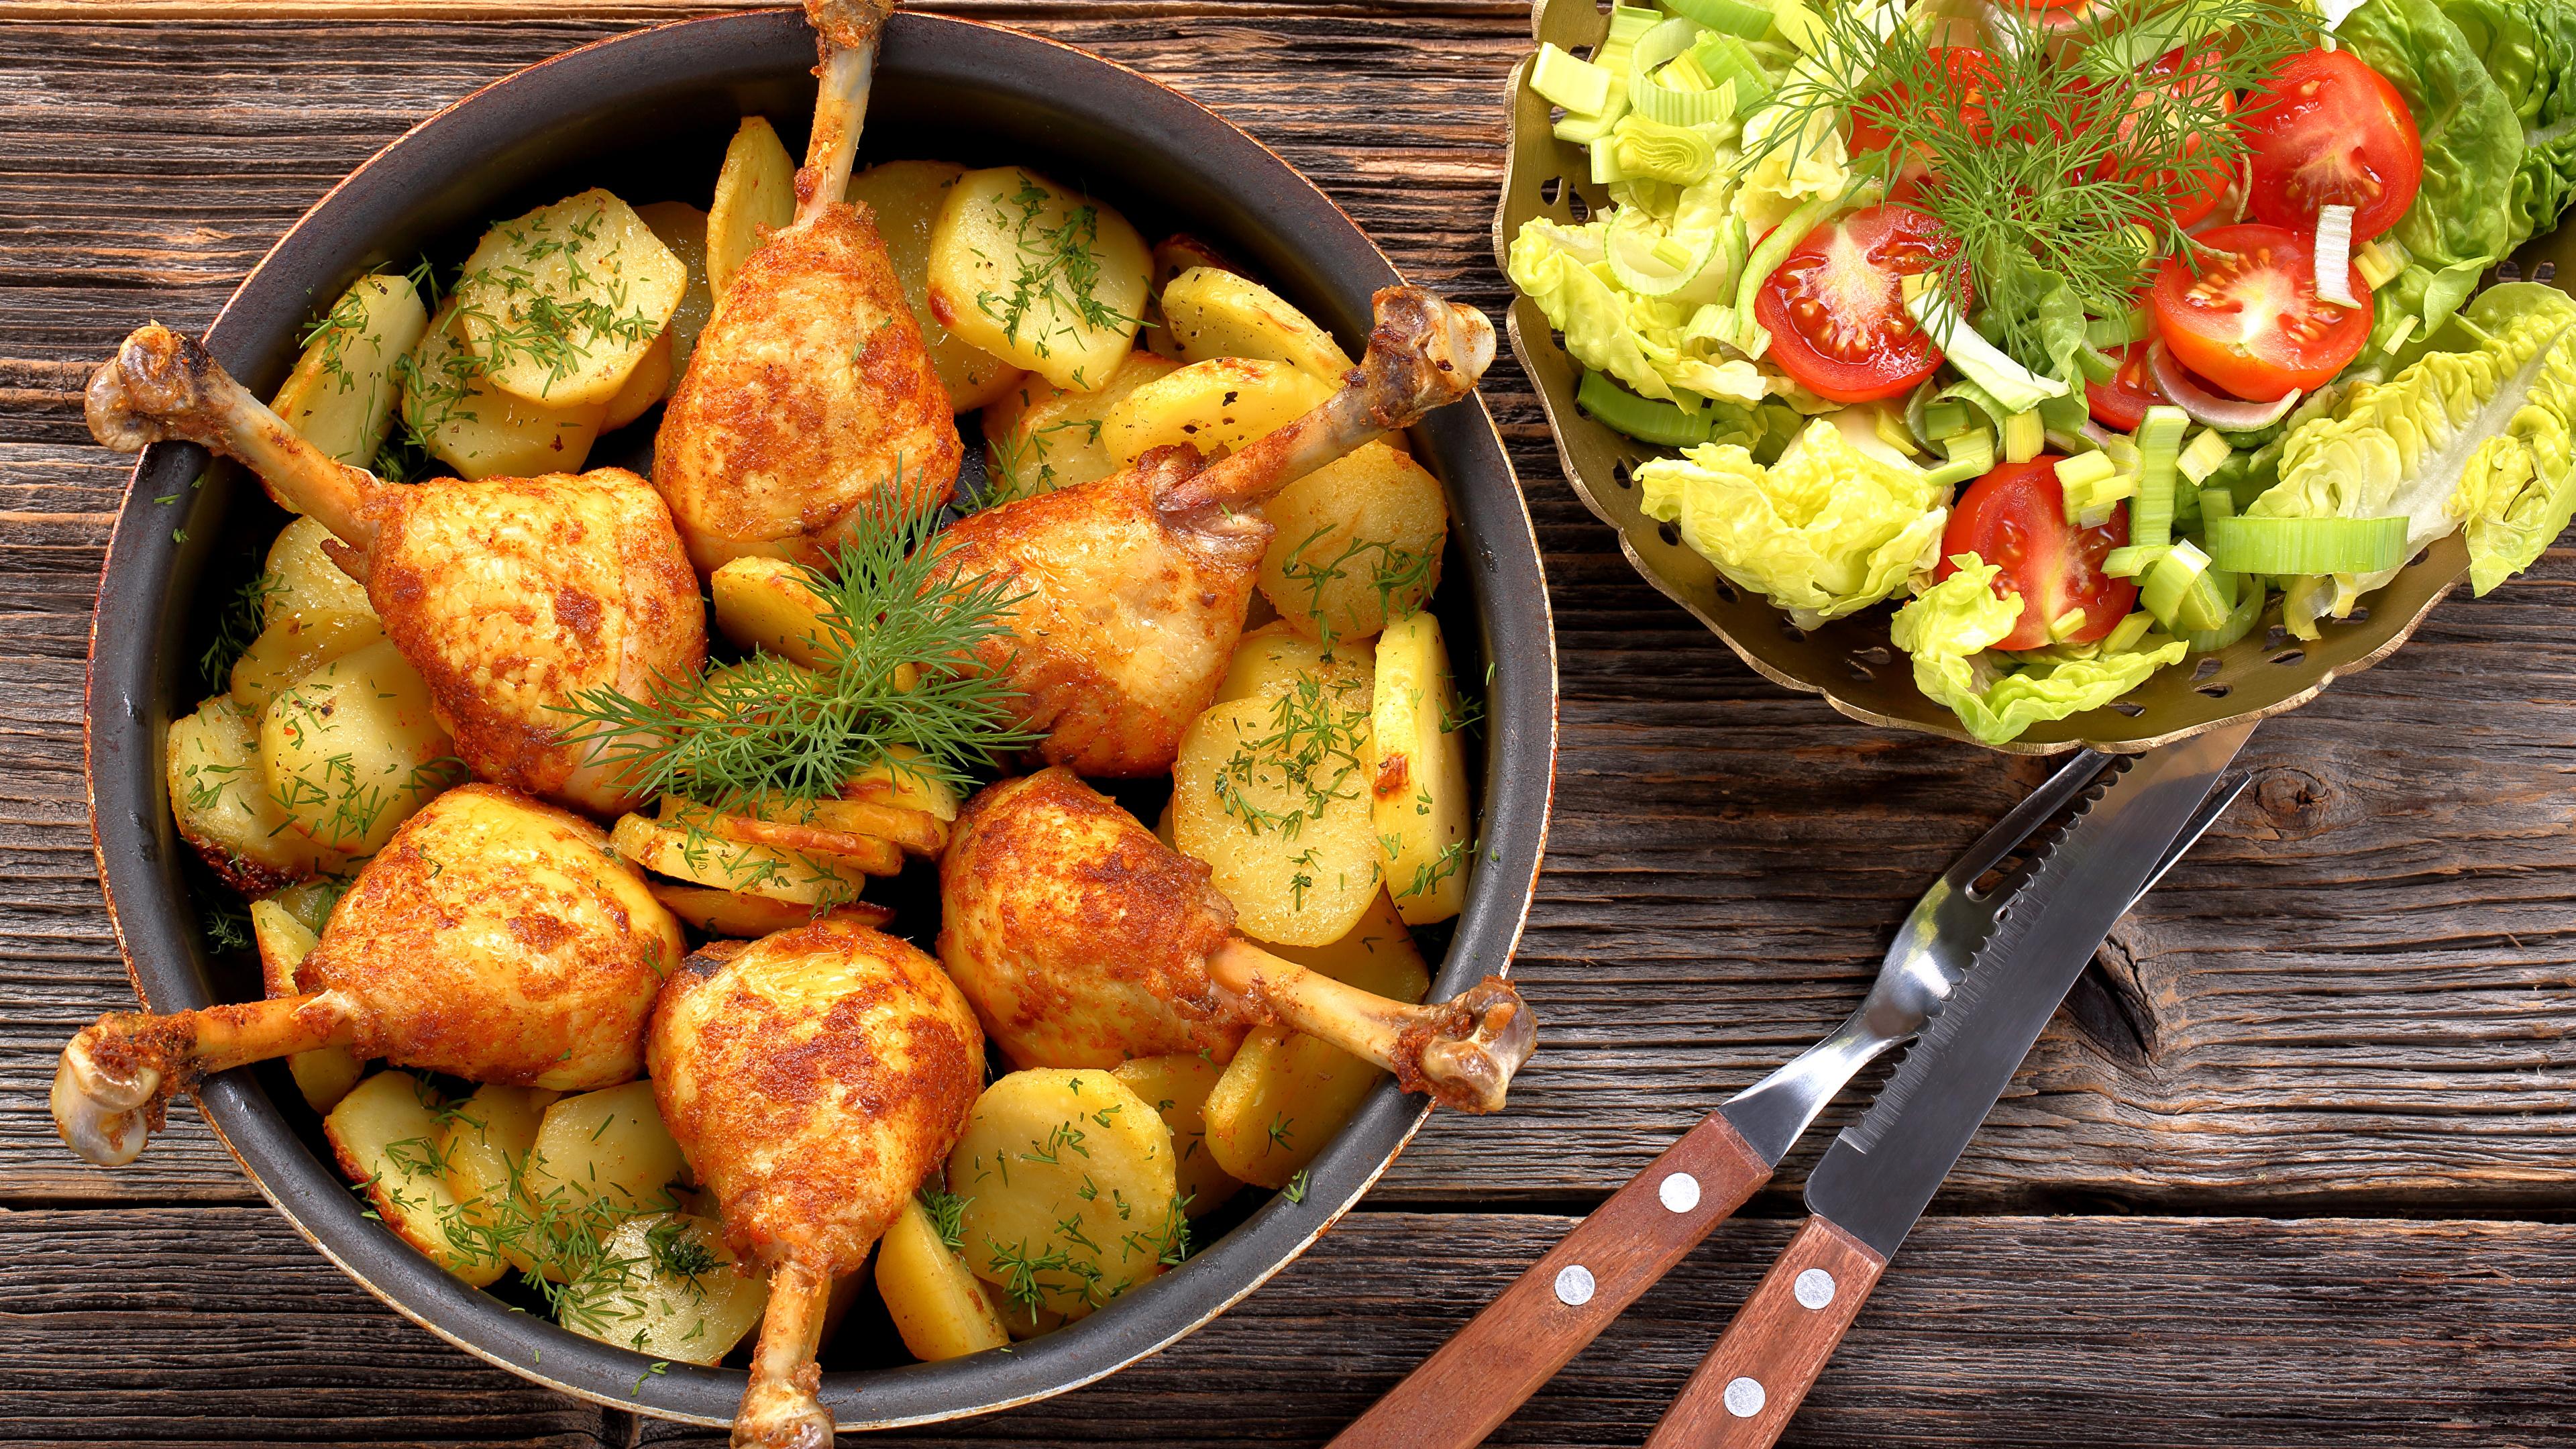 https://s1.1zoom.ru/b5252/874/Roast_Chicken_Potato_511389_3840x2160.jpg